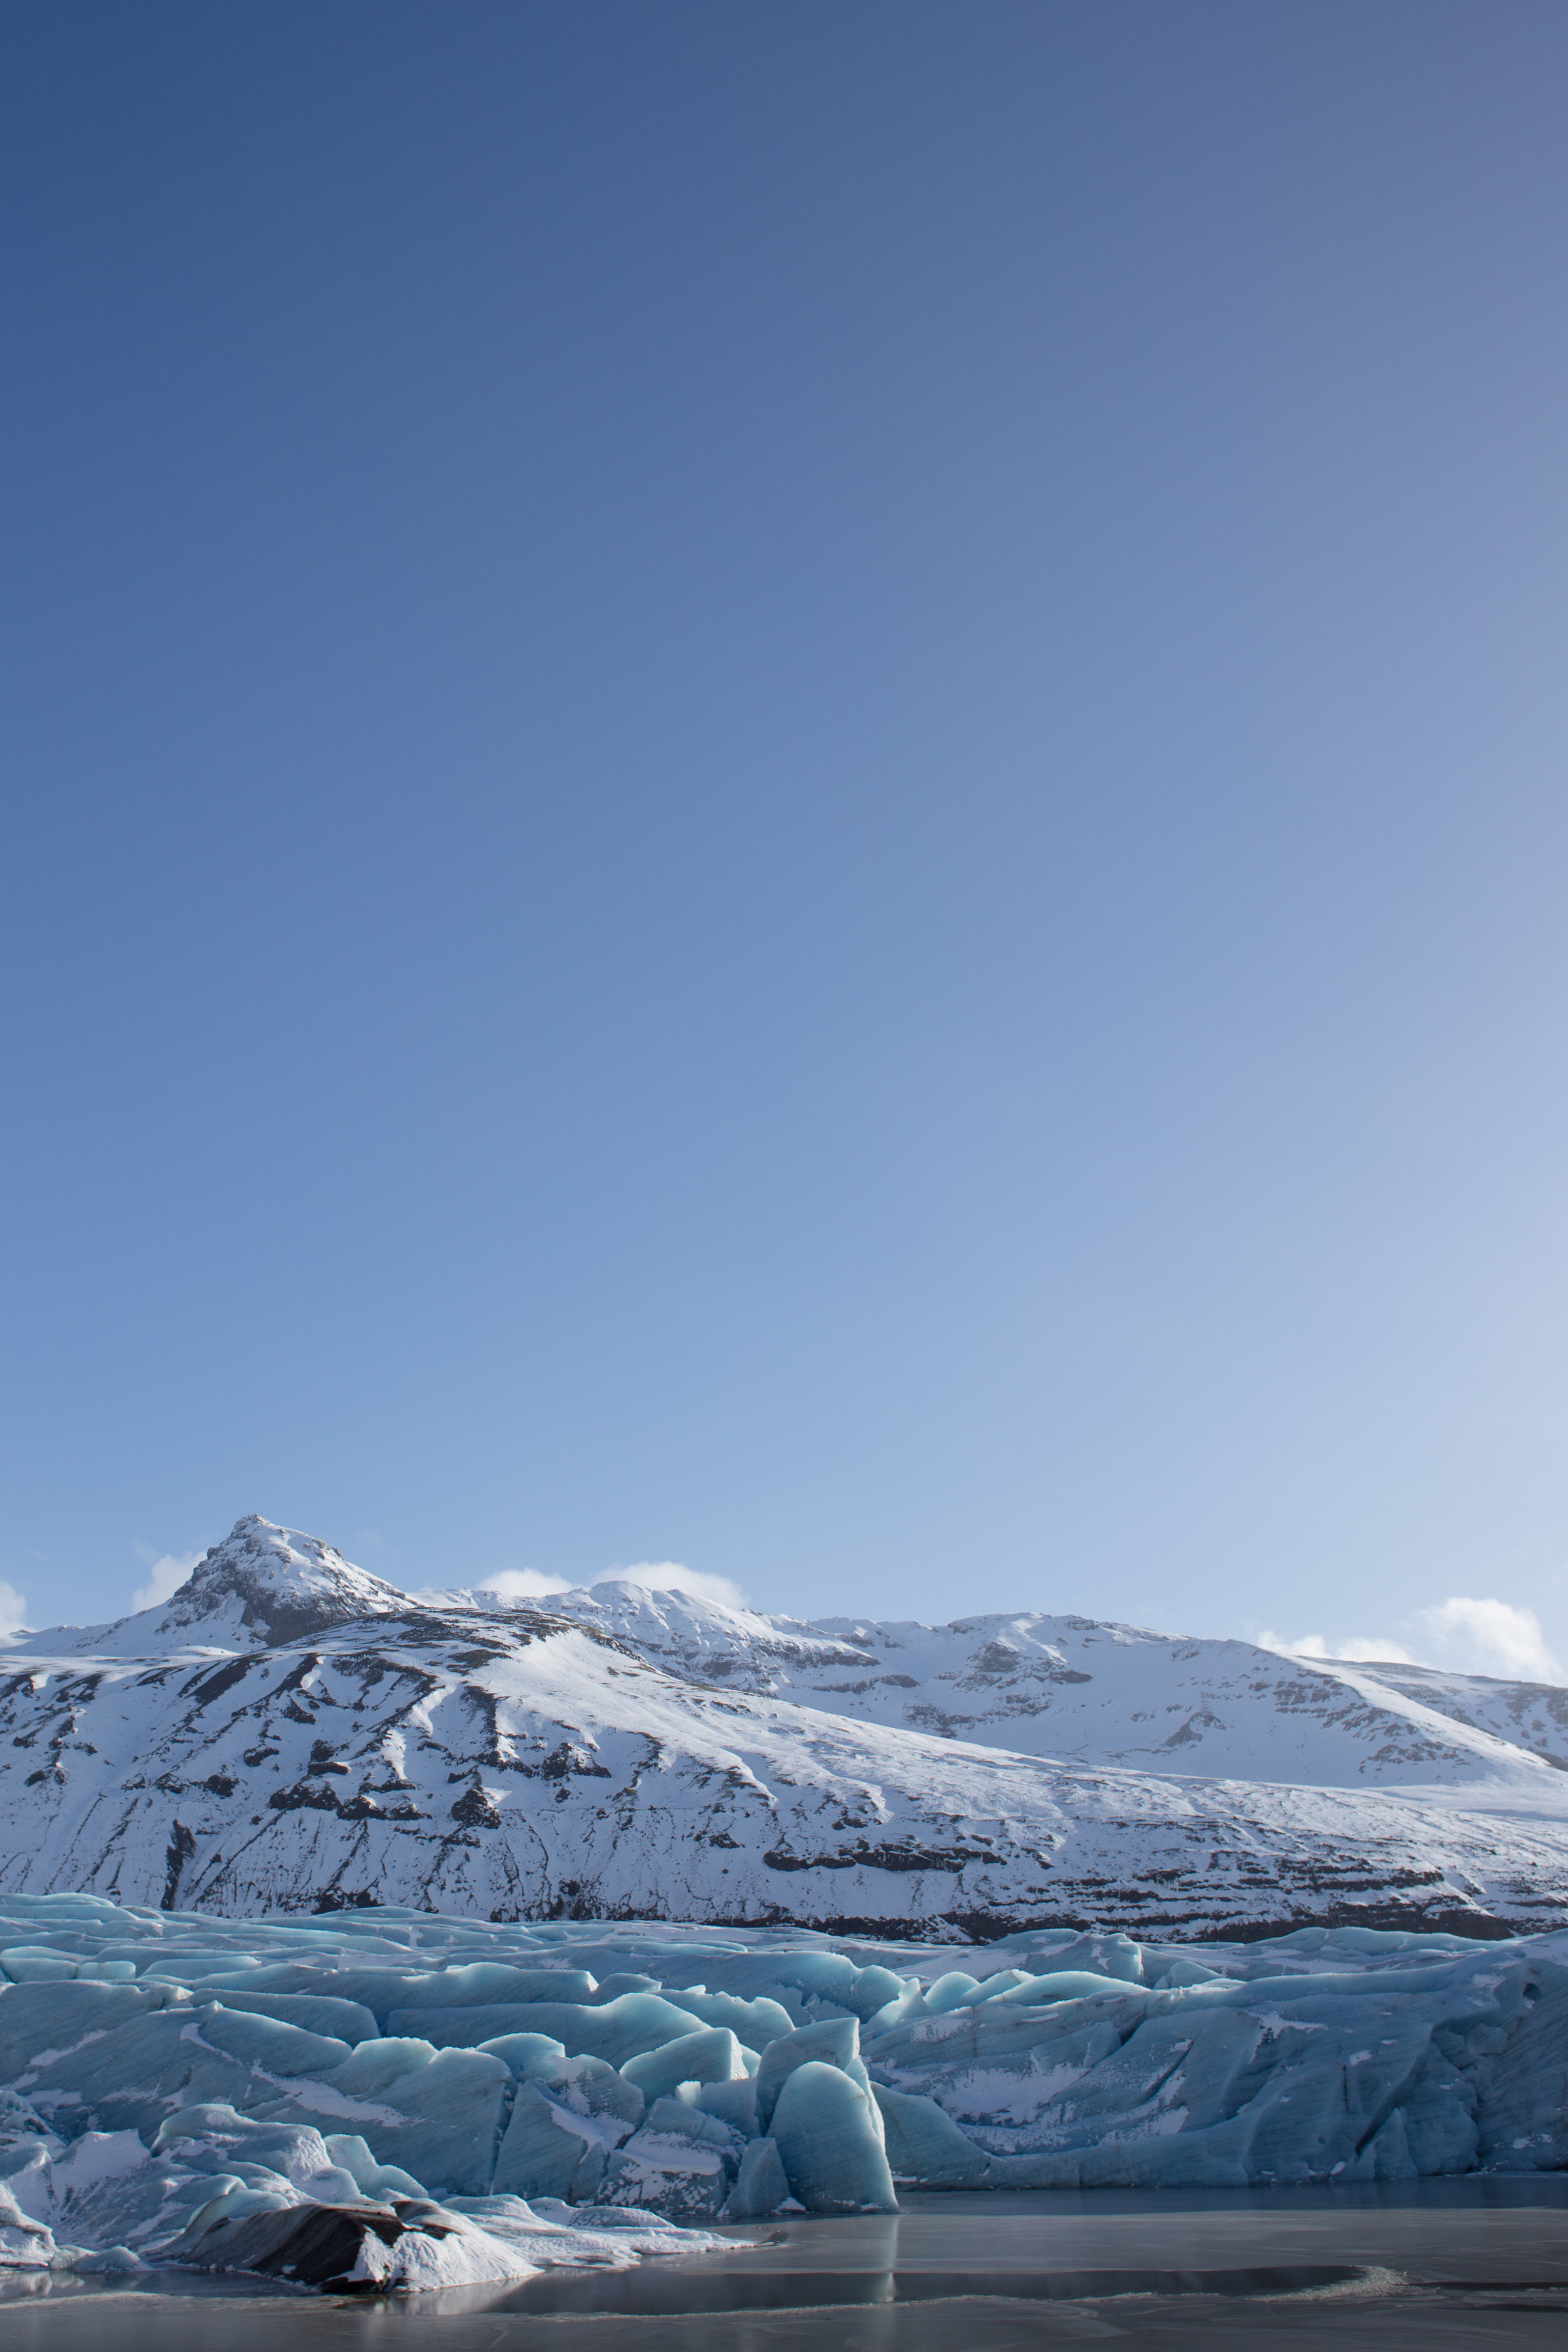 jermiah-schuster-iceland-429.jpg